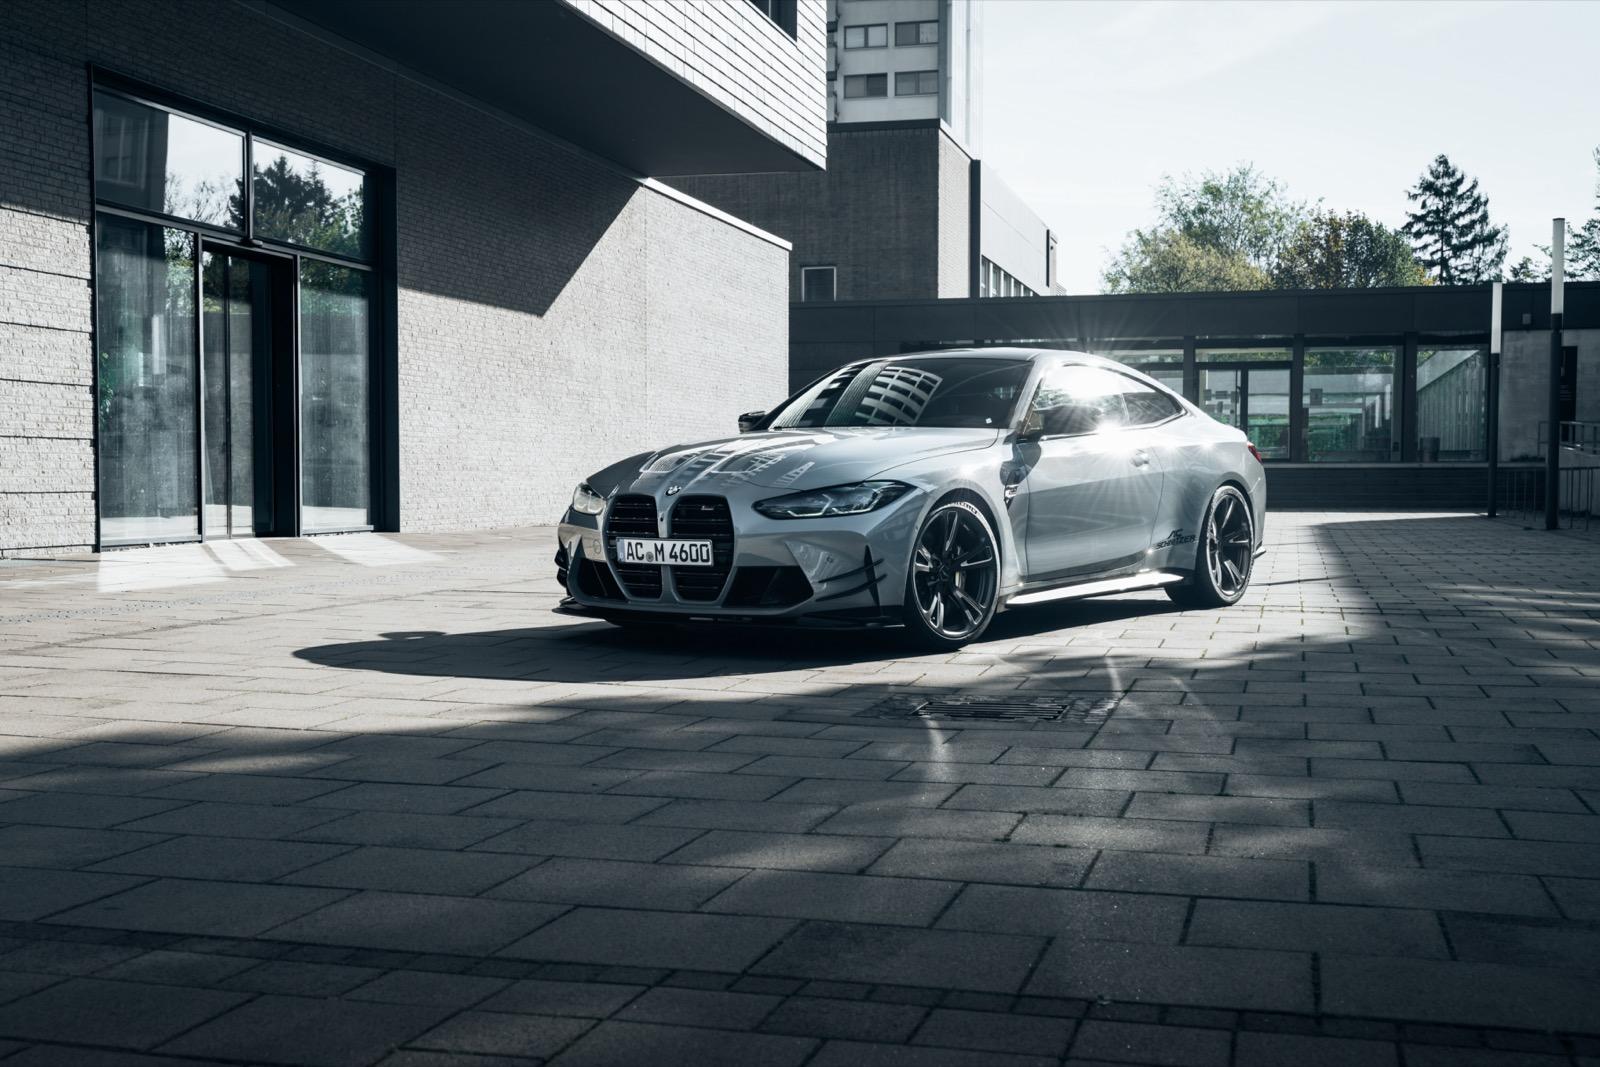 BMW-M4-by-AC-Schnitzer-2